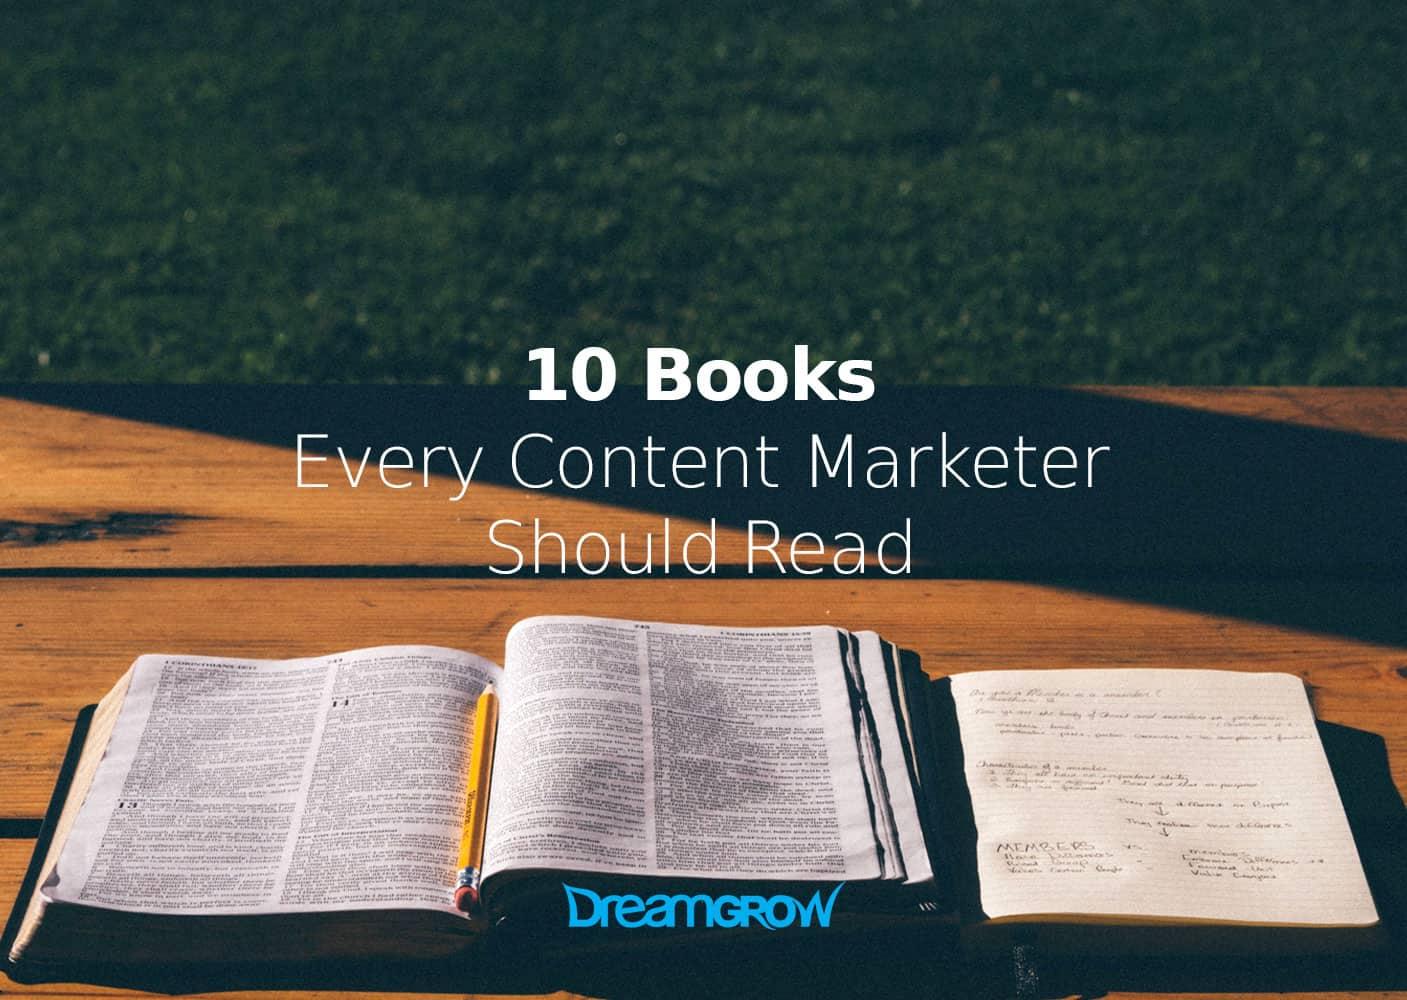 10-books-content-marketer